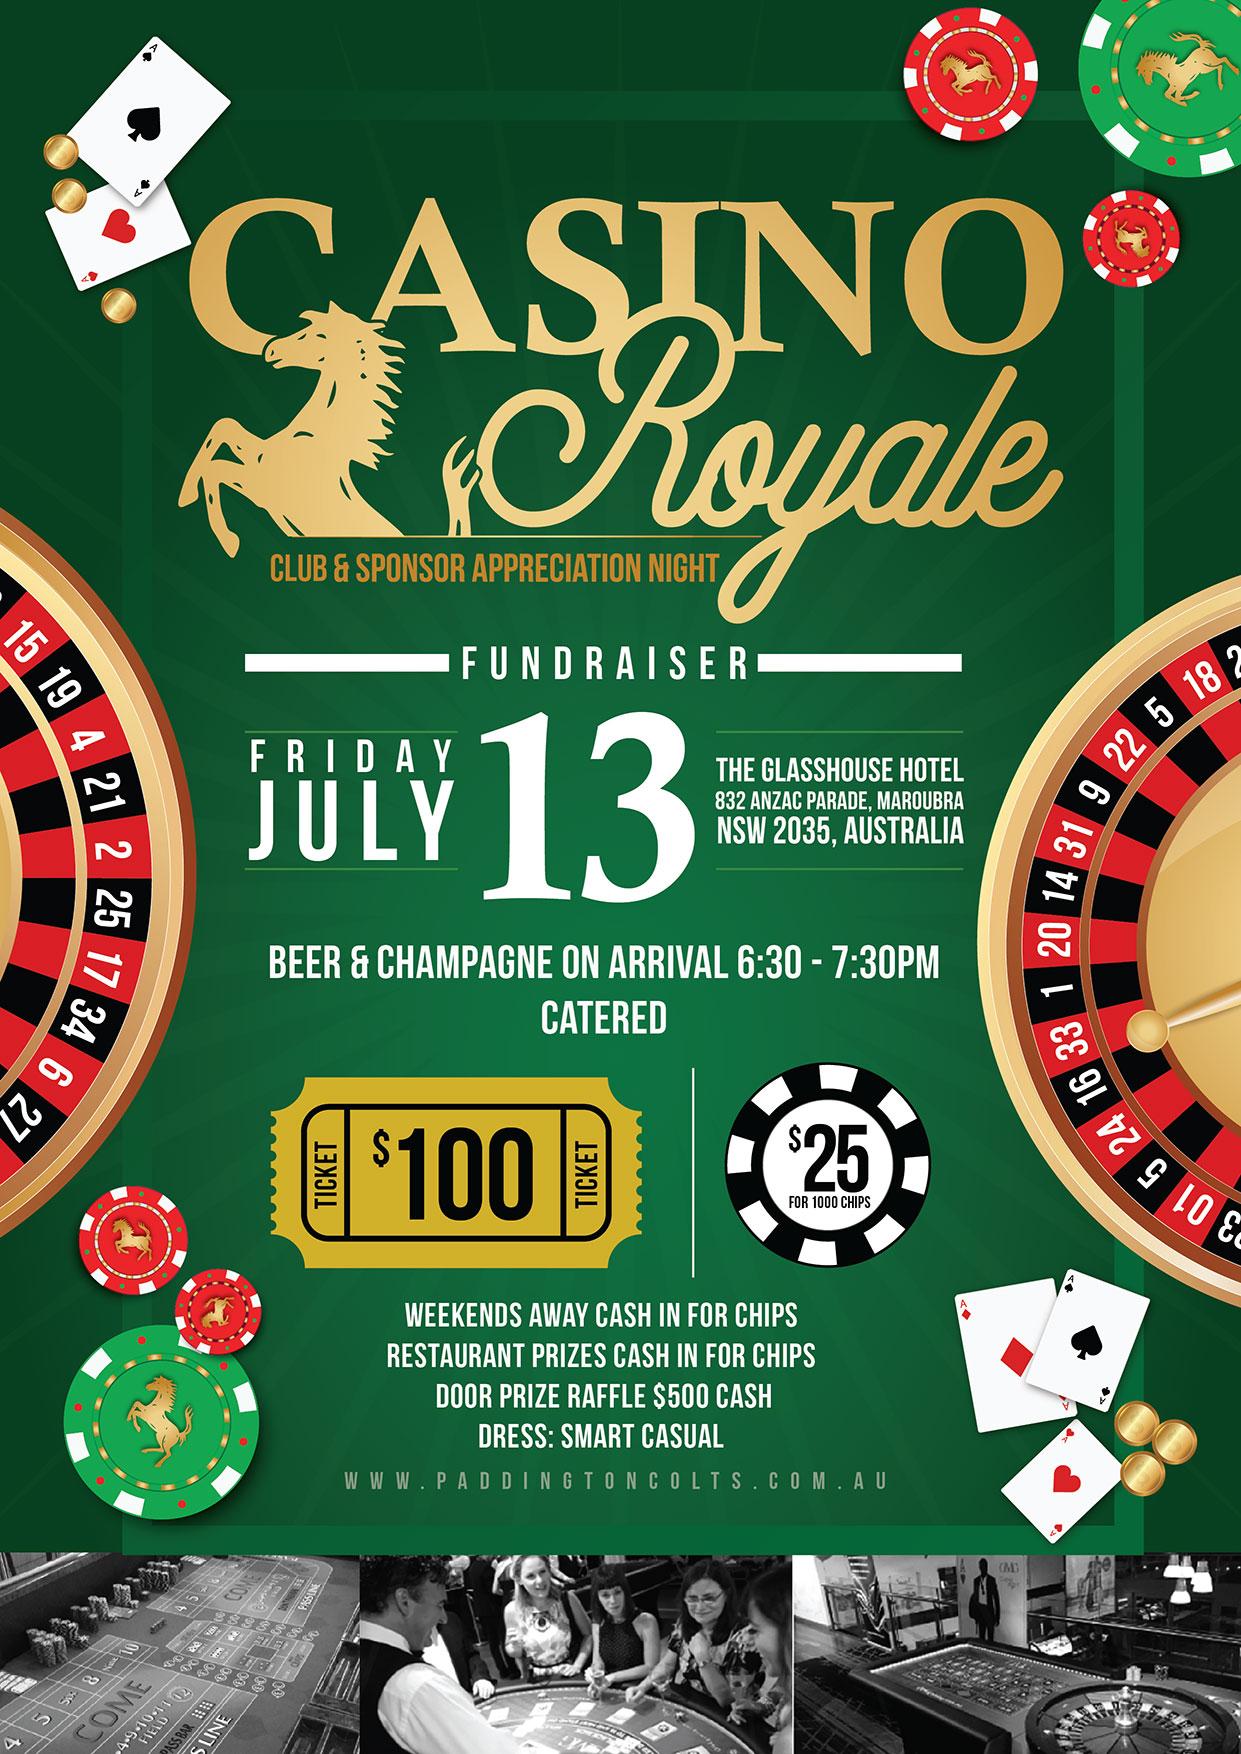 Paddington-Colts-Casino-Royale.jpg